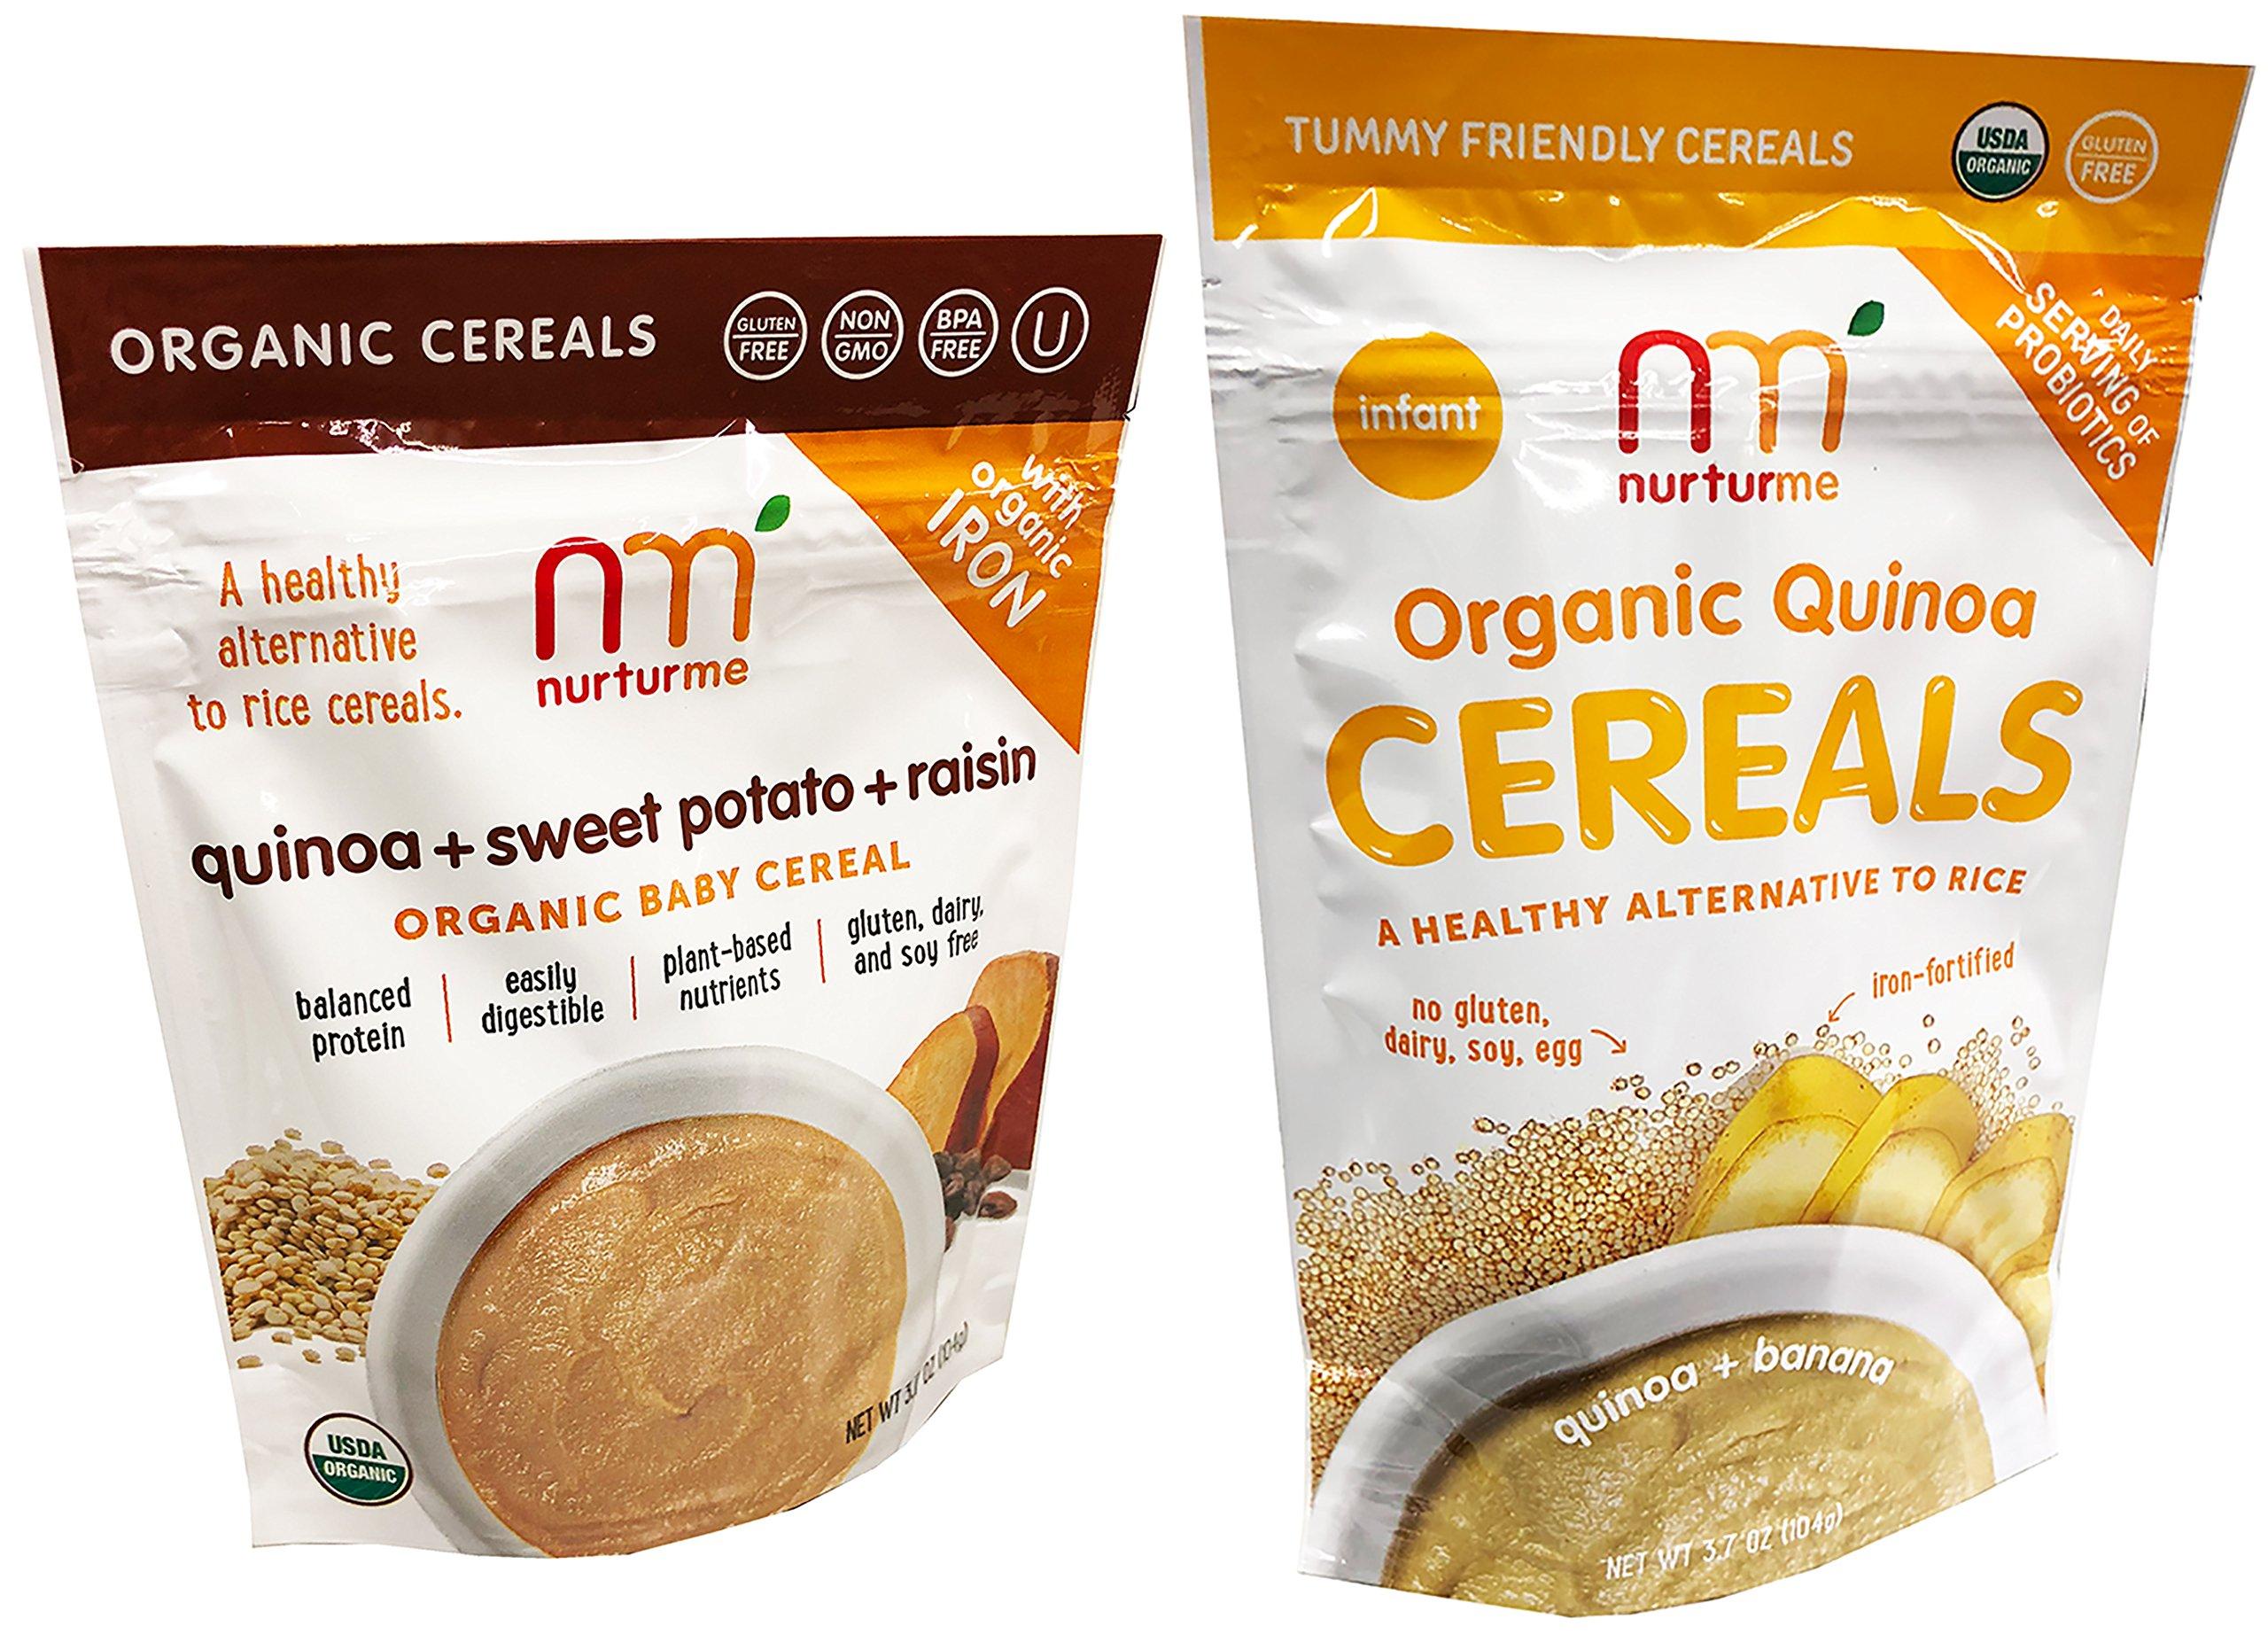 Nuturme Organic Quinoa Baby Cereals Pack of 2 (Quinoa and Banana and Quinoa Sweet Potato and Raisin) Each Bag Contains 8 Servings